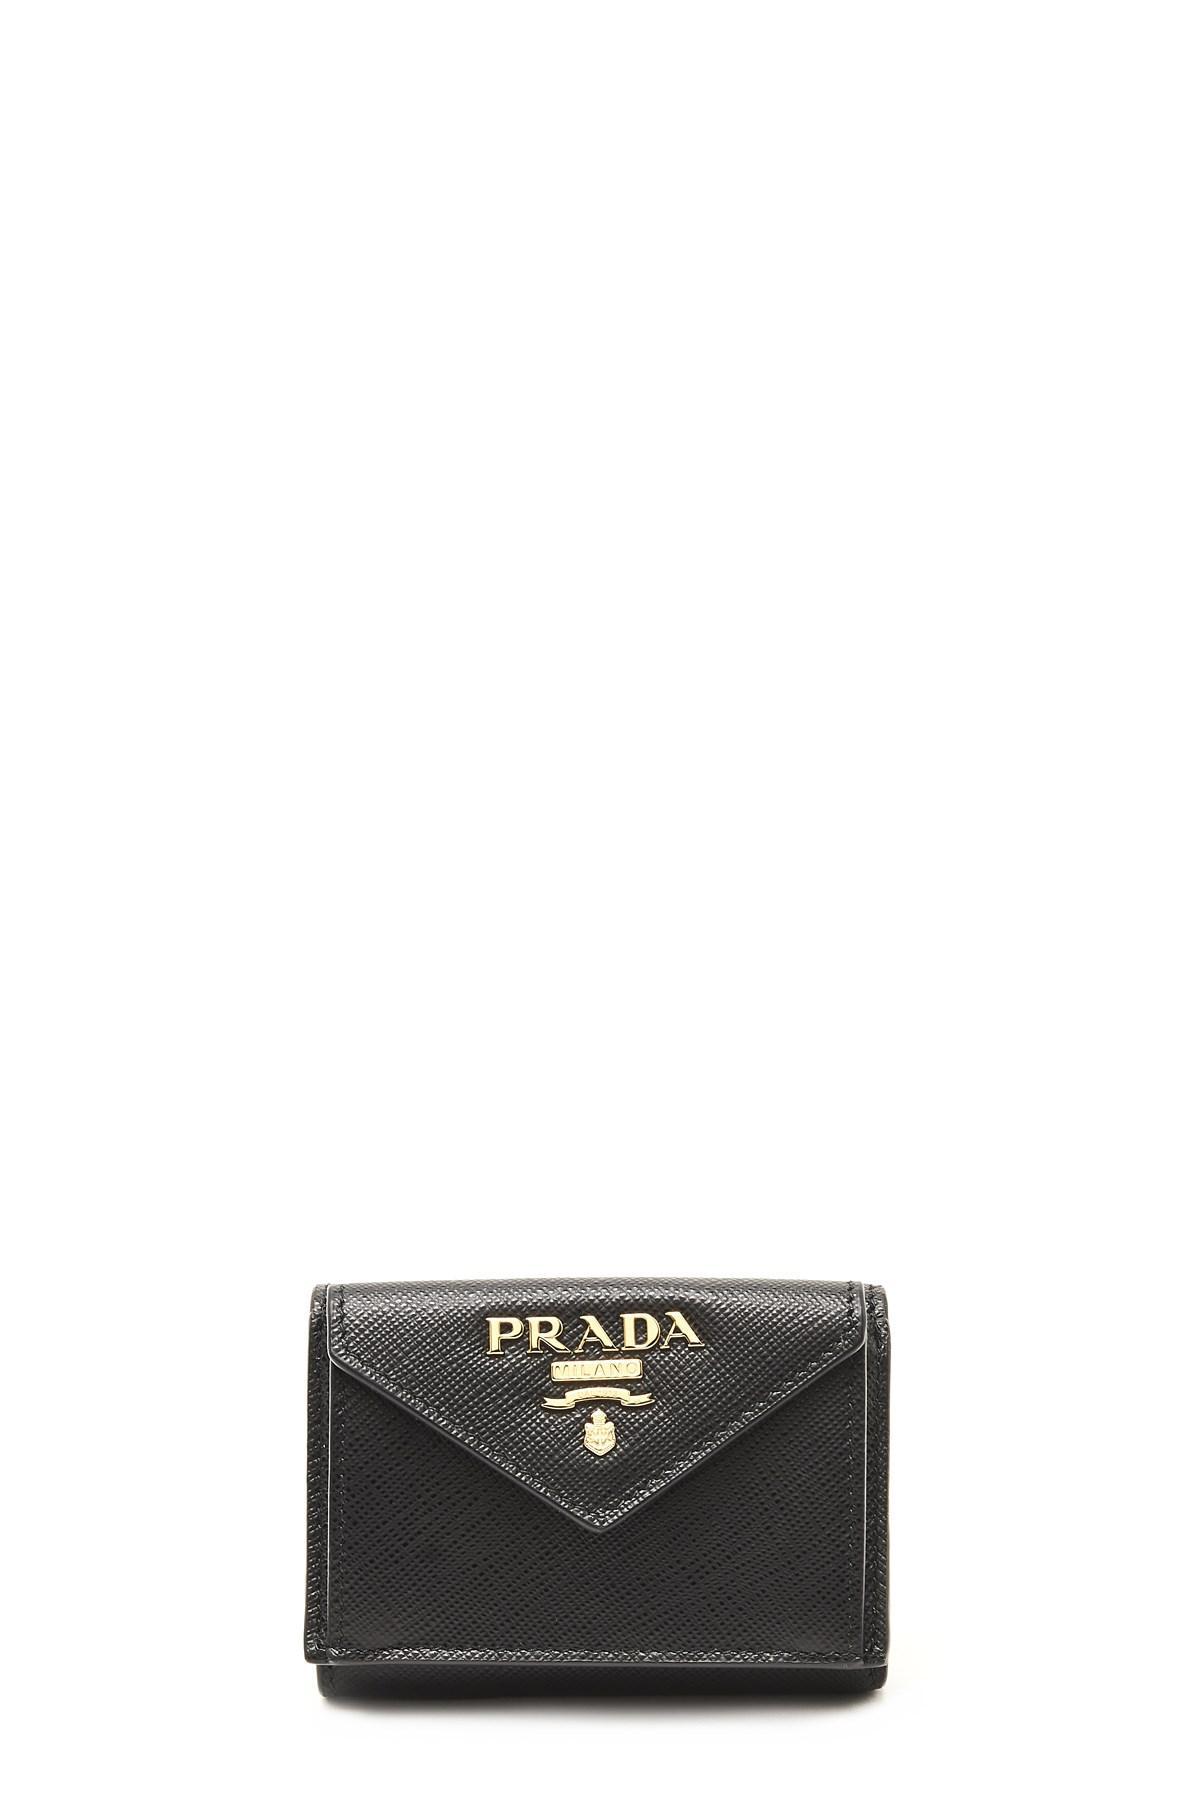 4cd7248e6705 Lyst - Prada Mini Wallet